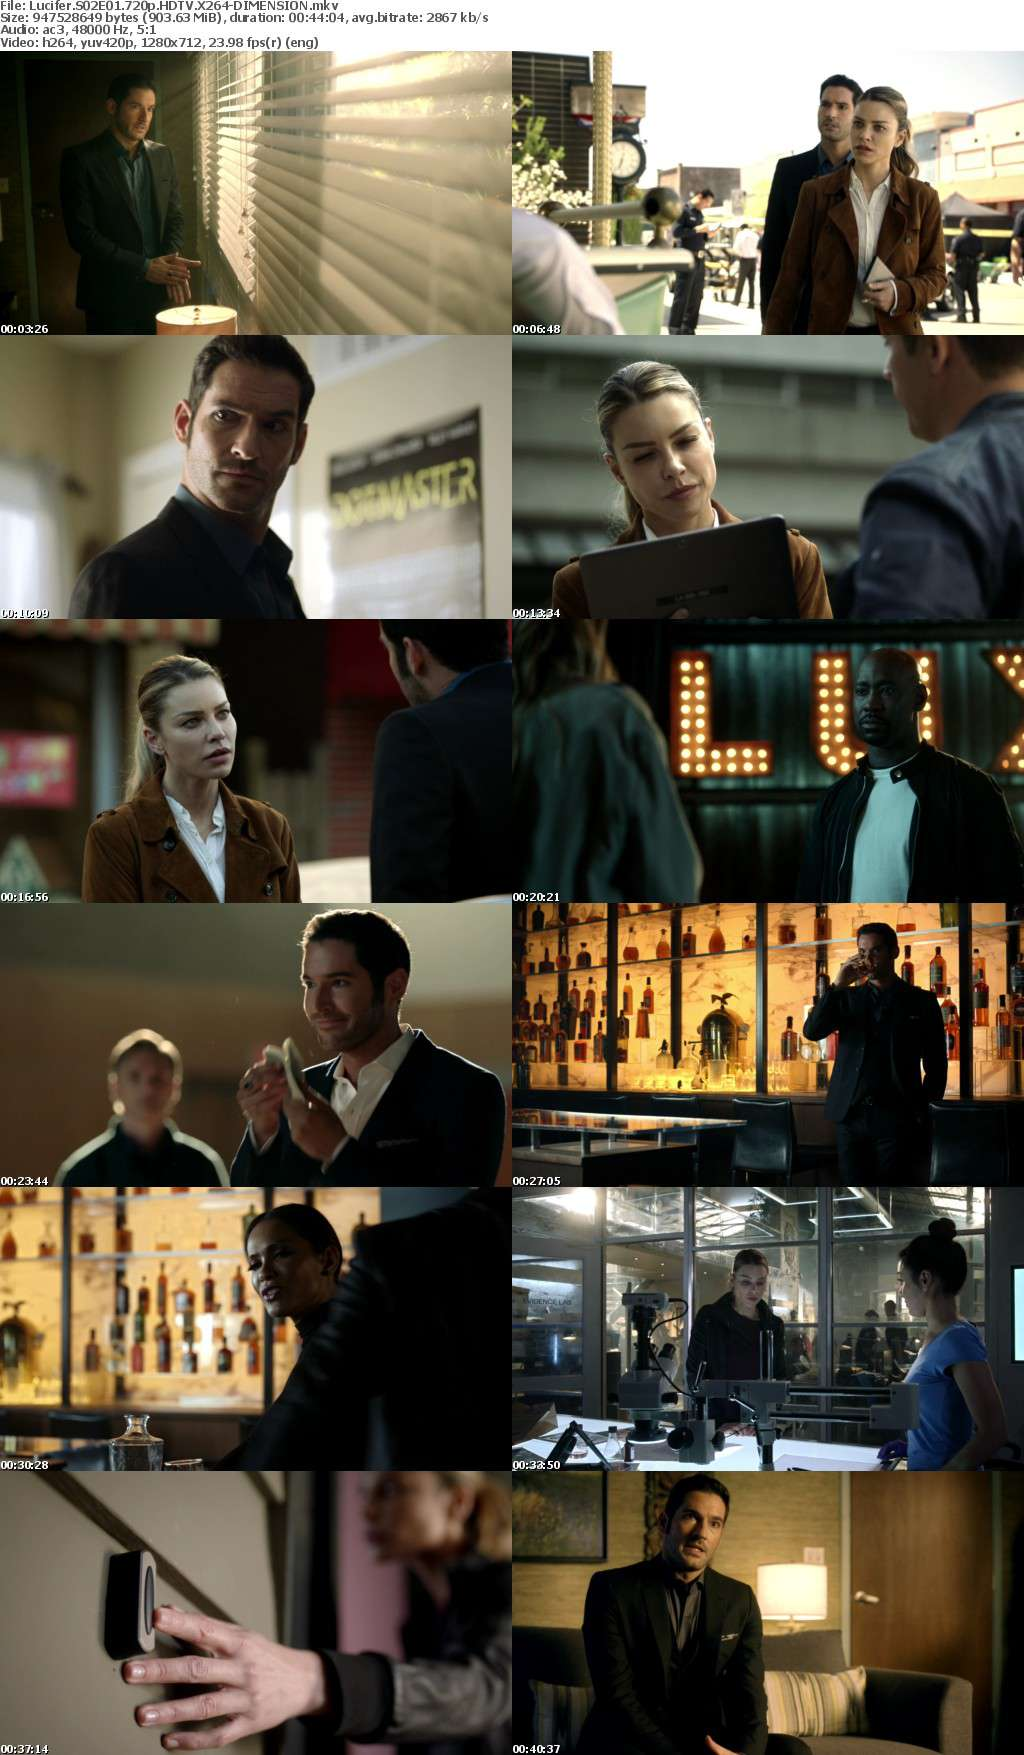 Lucifer S02E01 720p HDTV X264-DIMENSION